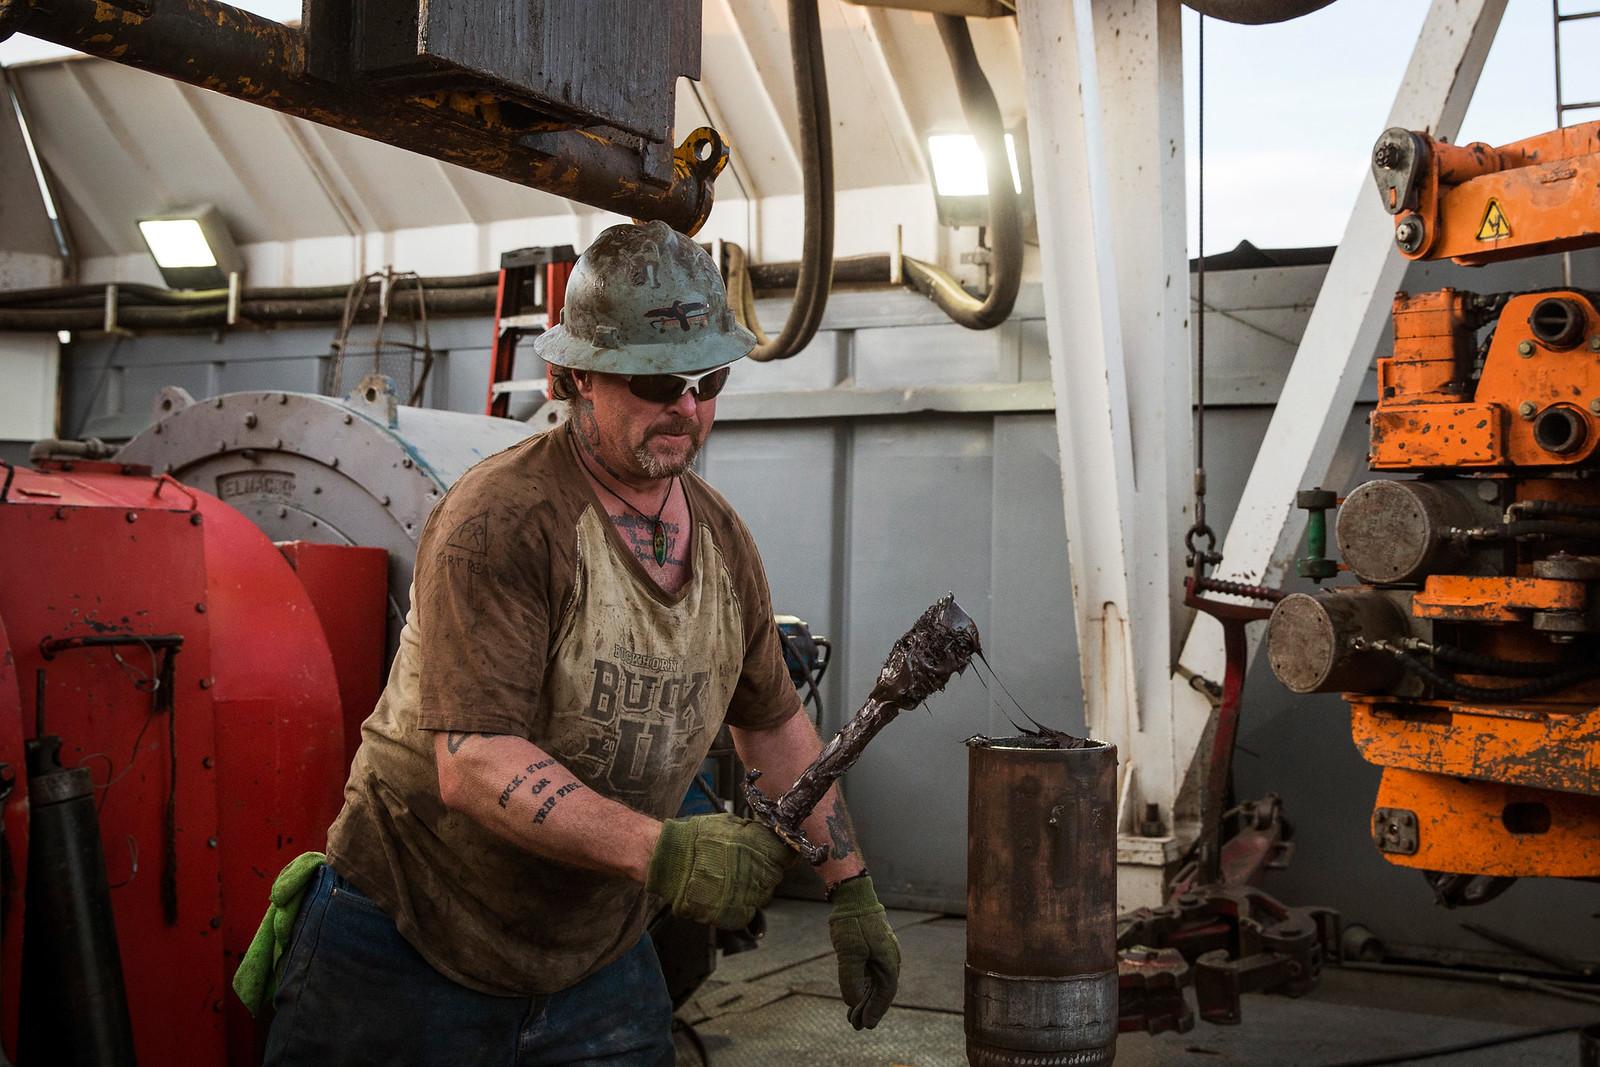 US-OIL-BOOM-SHIFTS-THE-LANDSCAPE-OF-RURAL-NORTH-DAKOTA